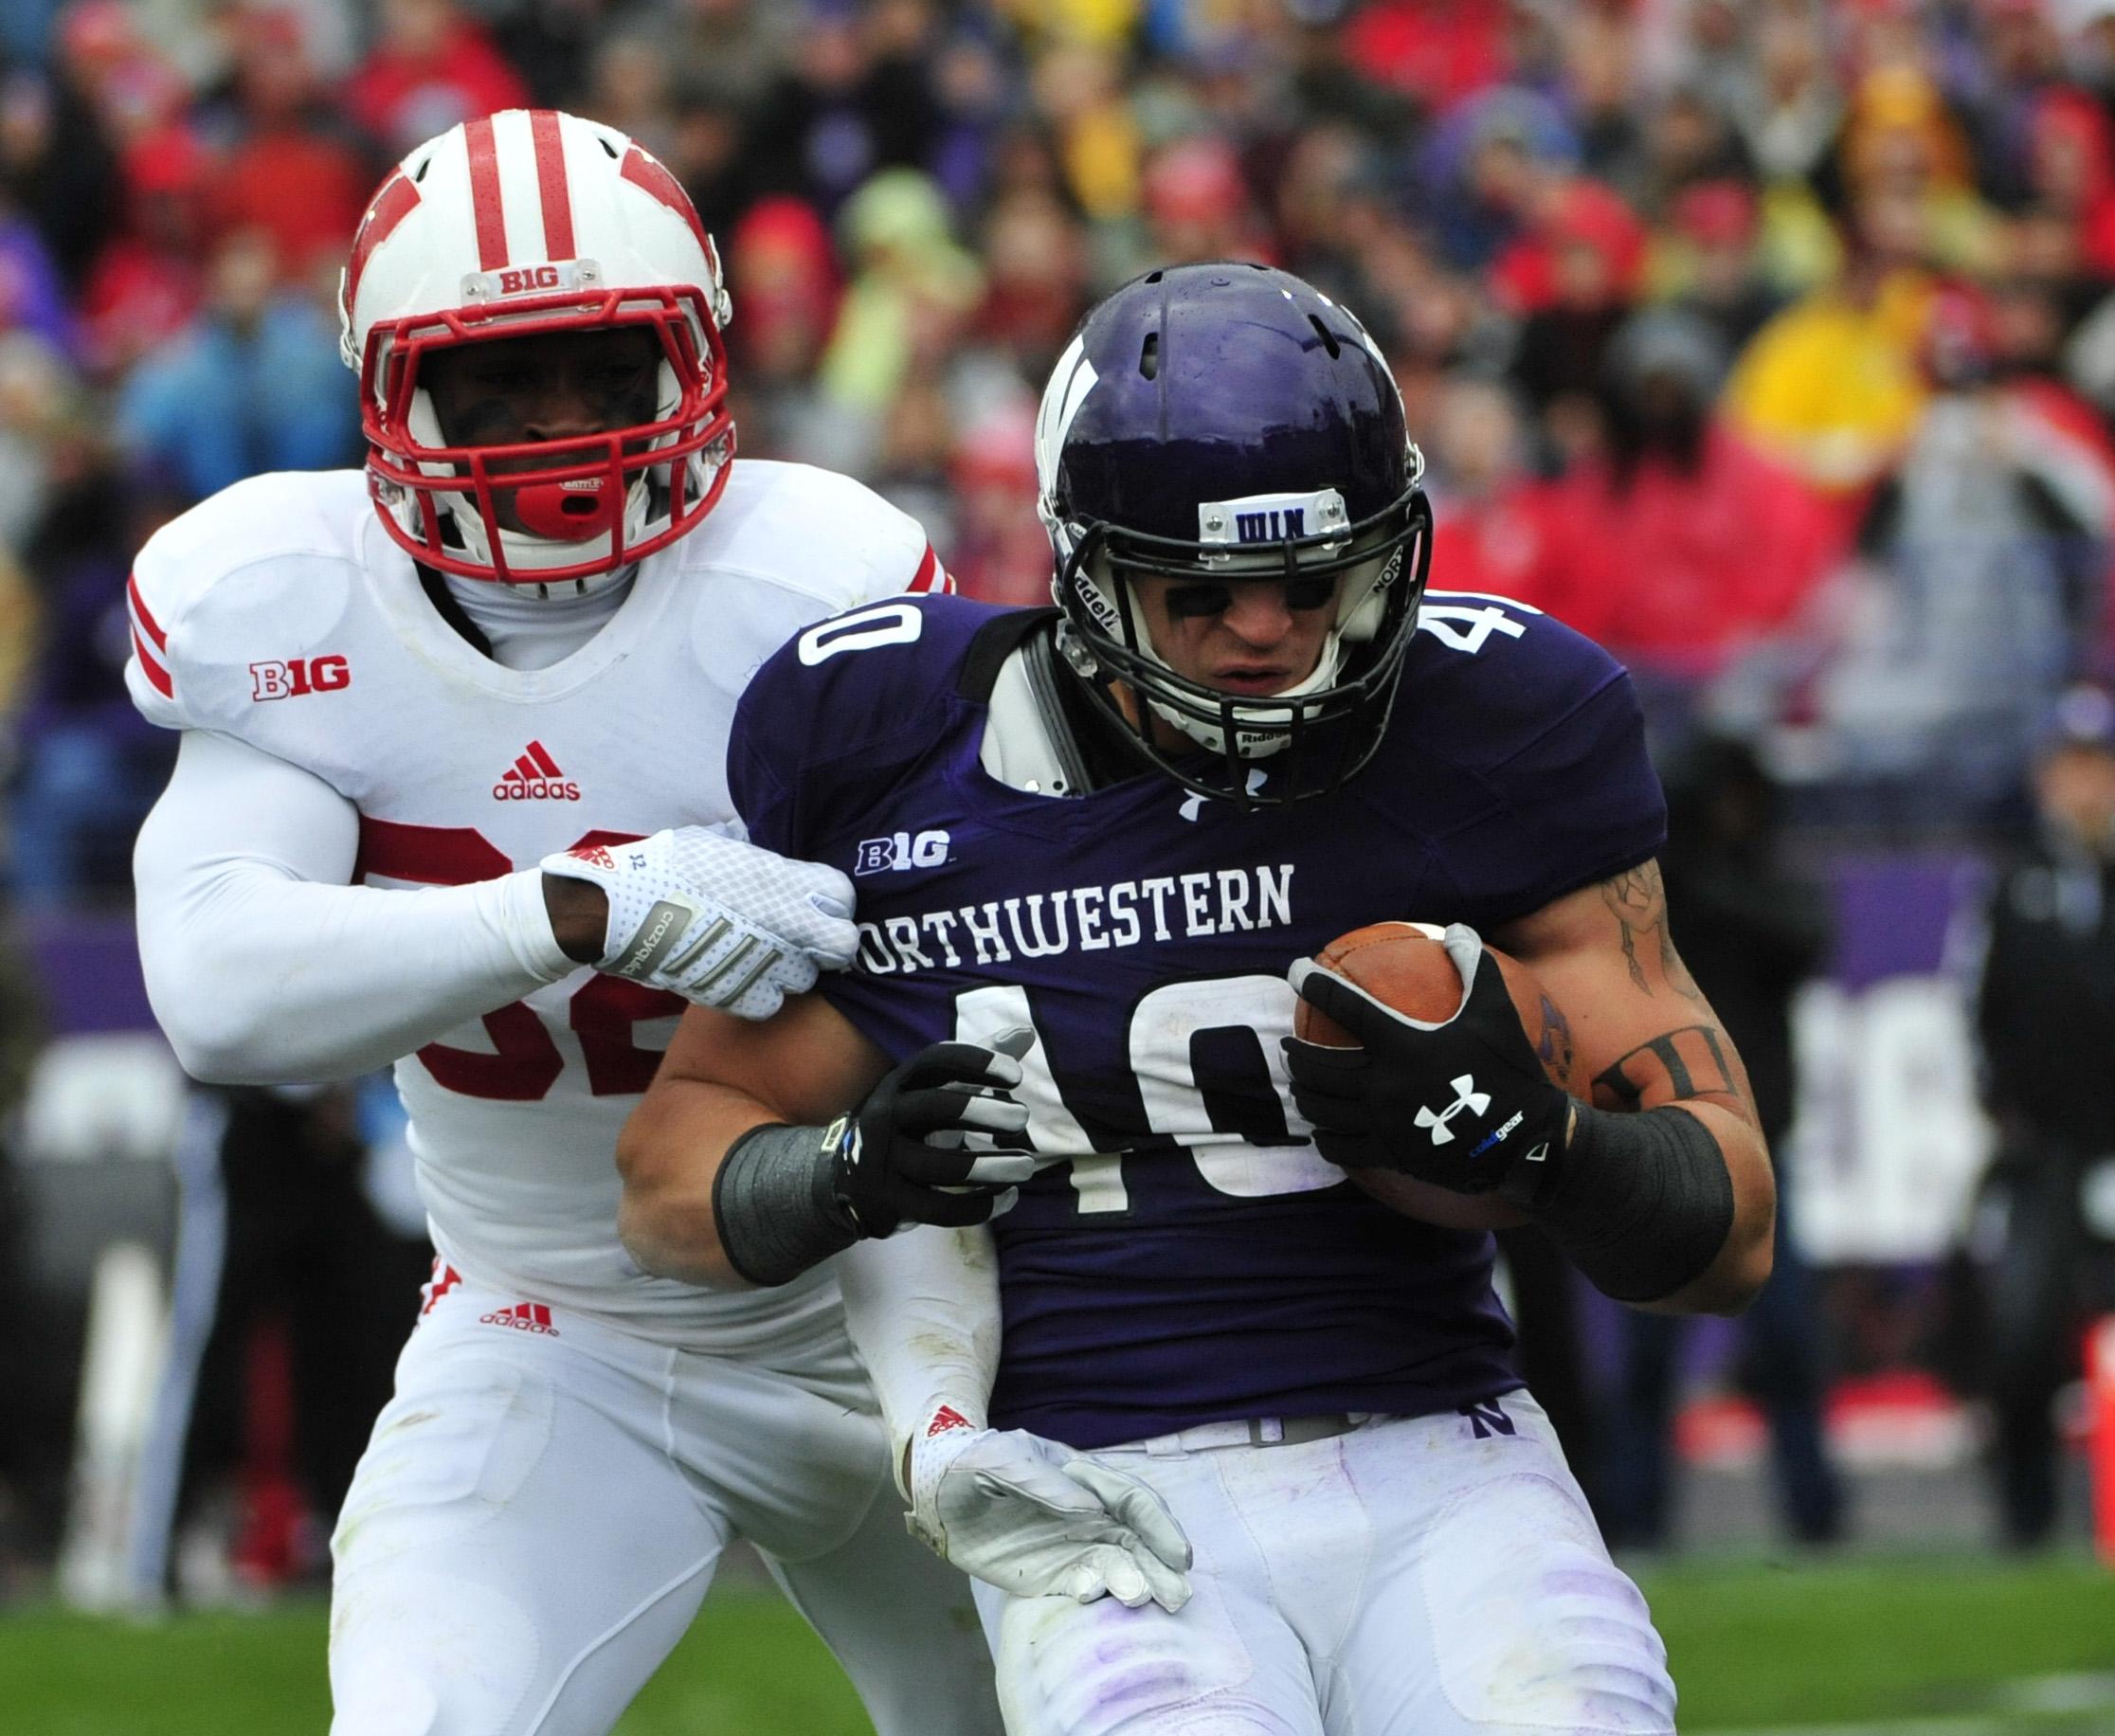 Wisconsin linebacker Leon Jacobs pursues Northwestern's Dan Vitale.